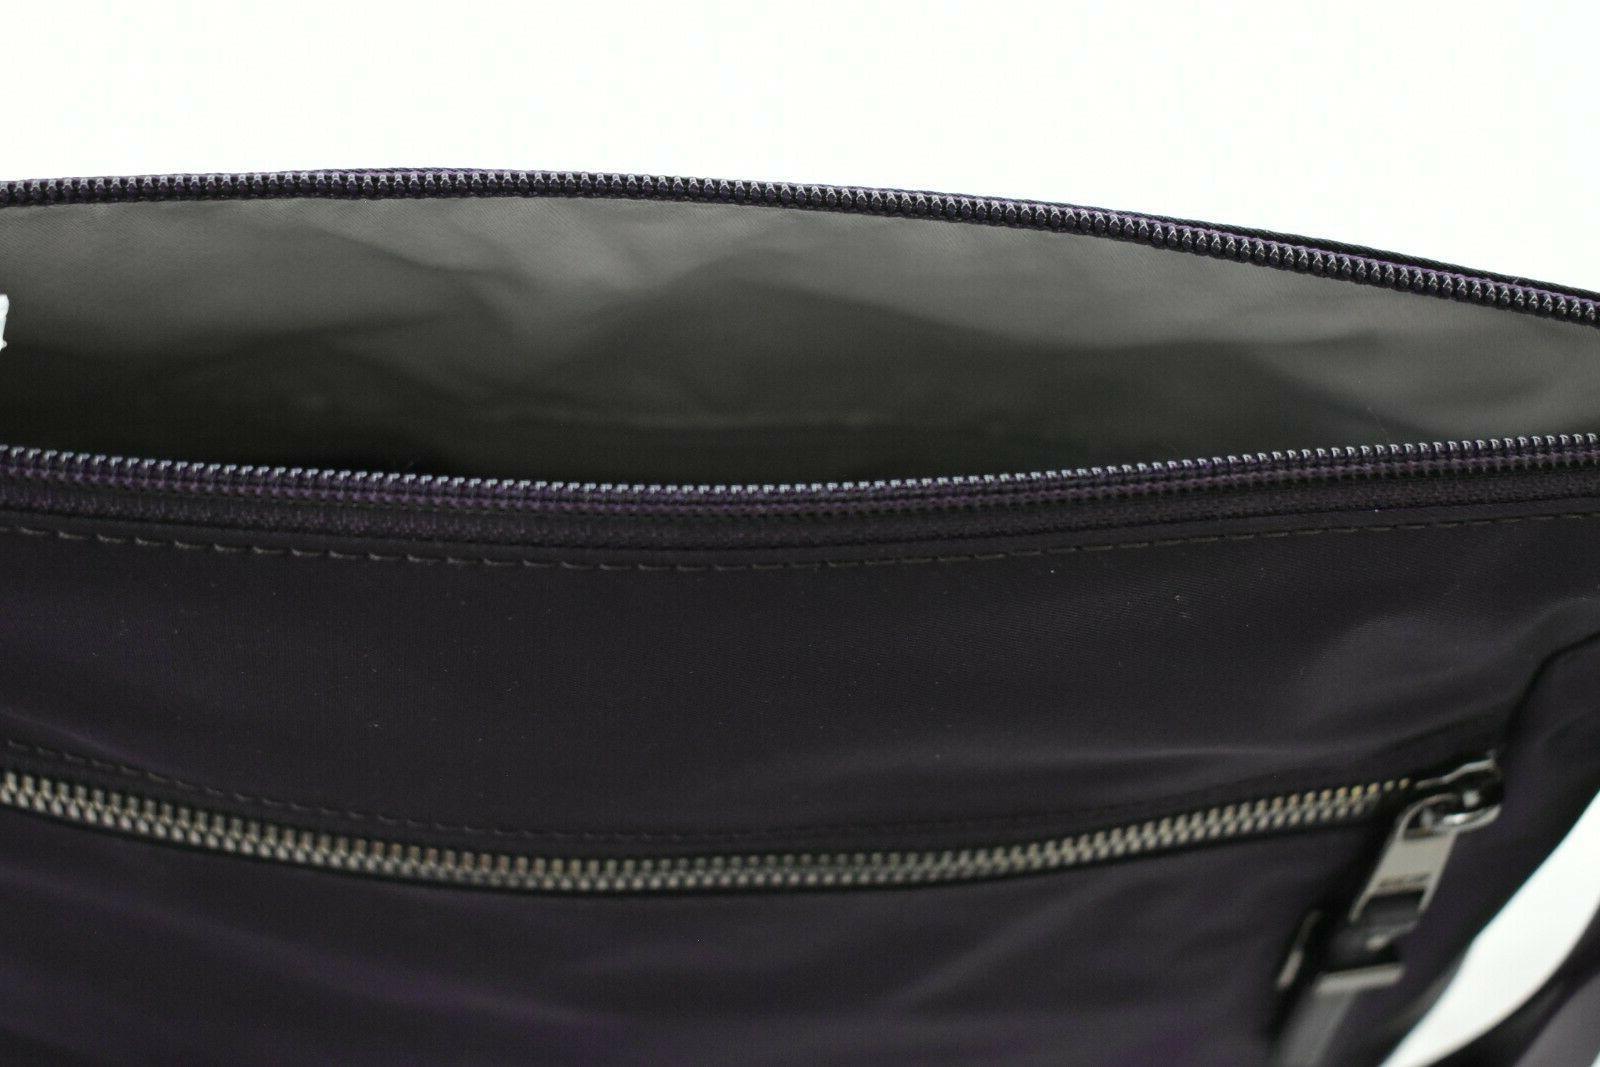 Tumi Voyageur Crossbody Bag Purple Purse Top Zip $245